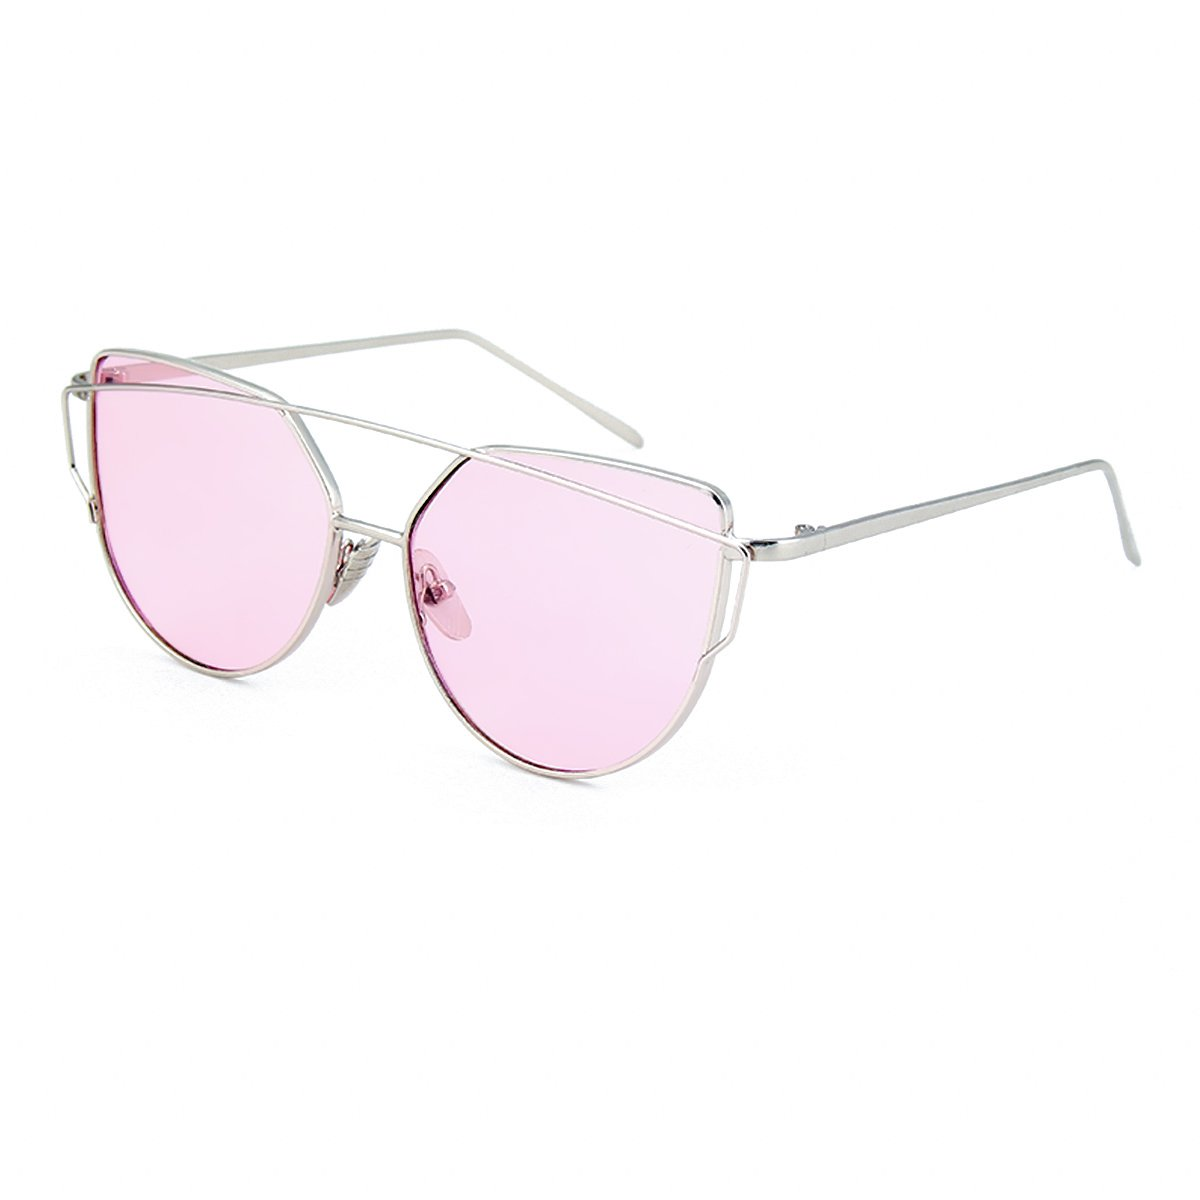 WISH CLUB Women Cat Eye Sunglasses Oversized Transparent Clear Fashion Lens Durable UV400 Glasses(Pink)